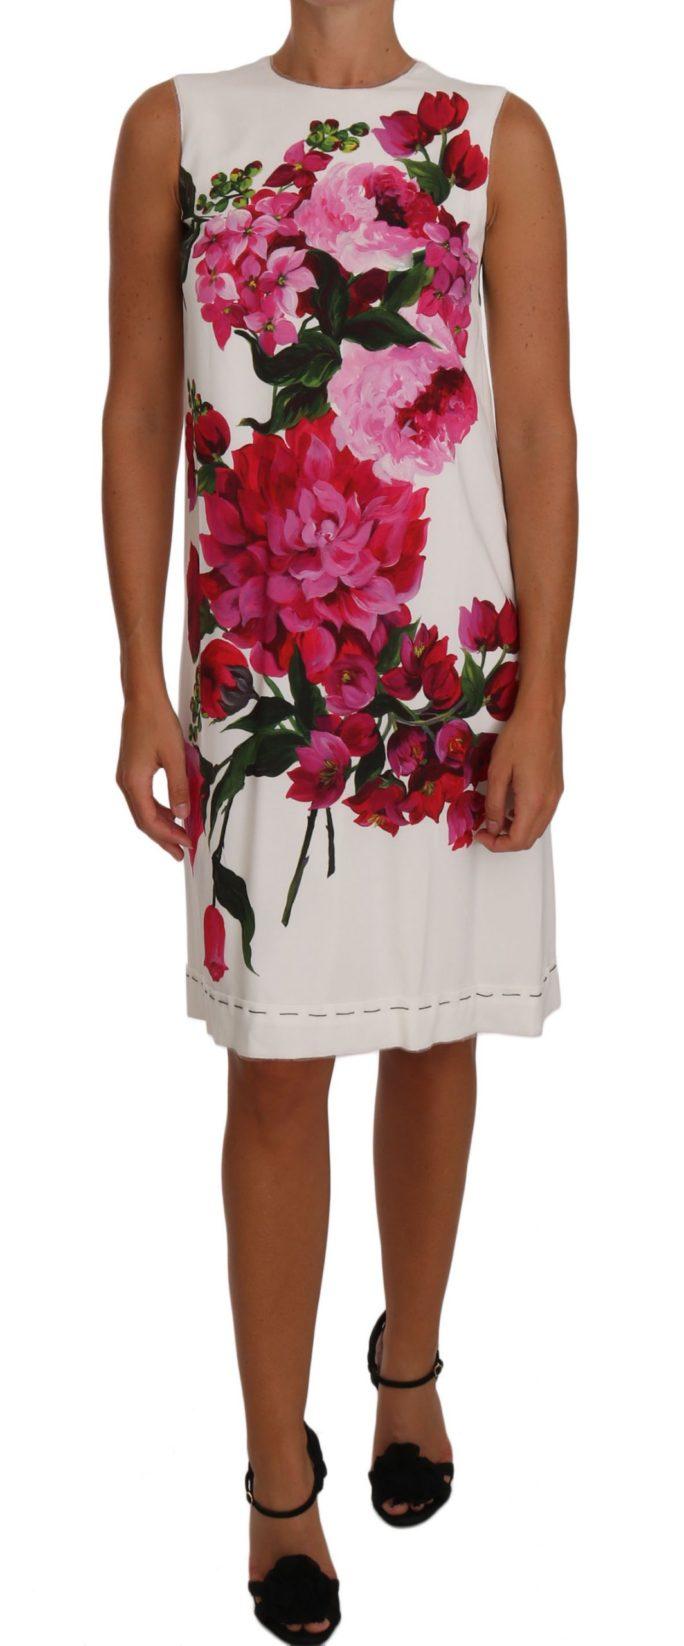 637384 Pink White Peony Print A Line Shift Gown Dress.jpg